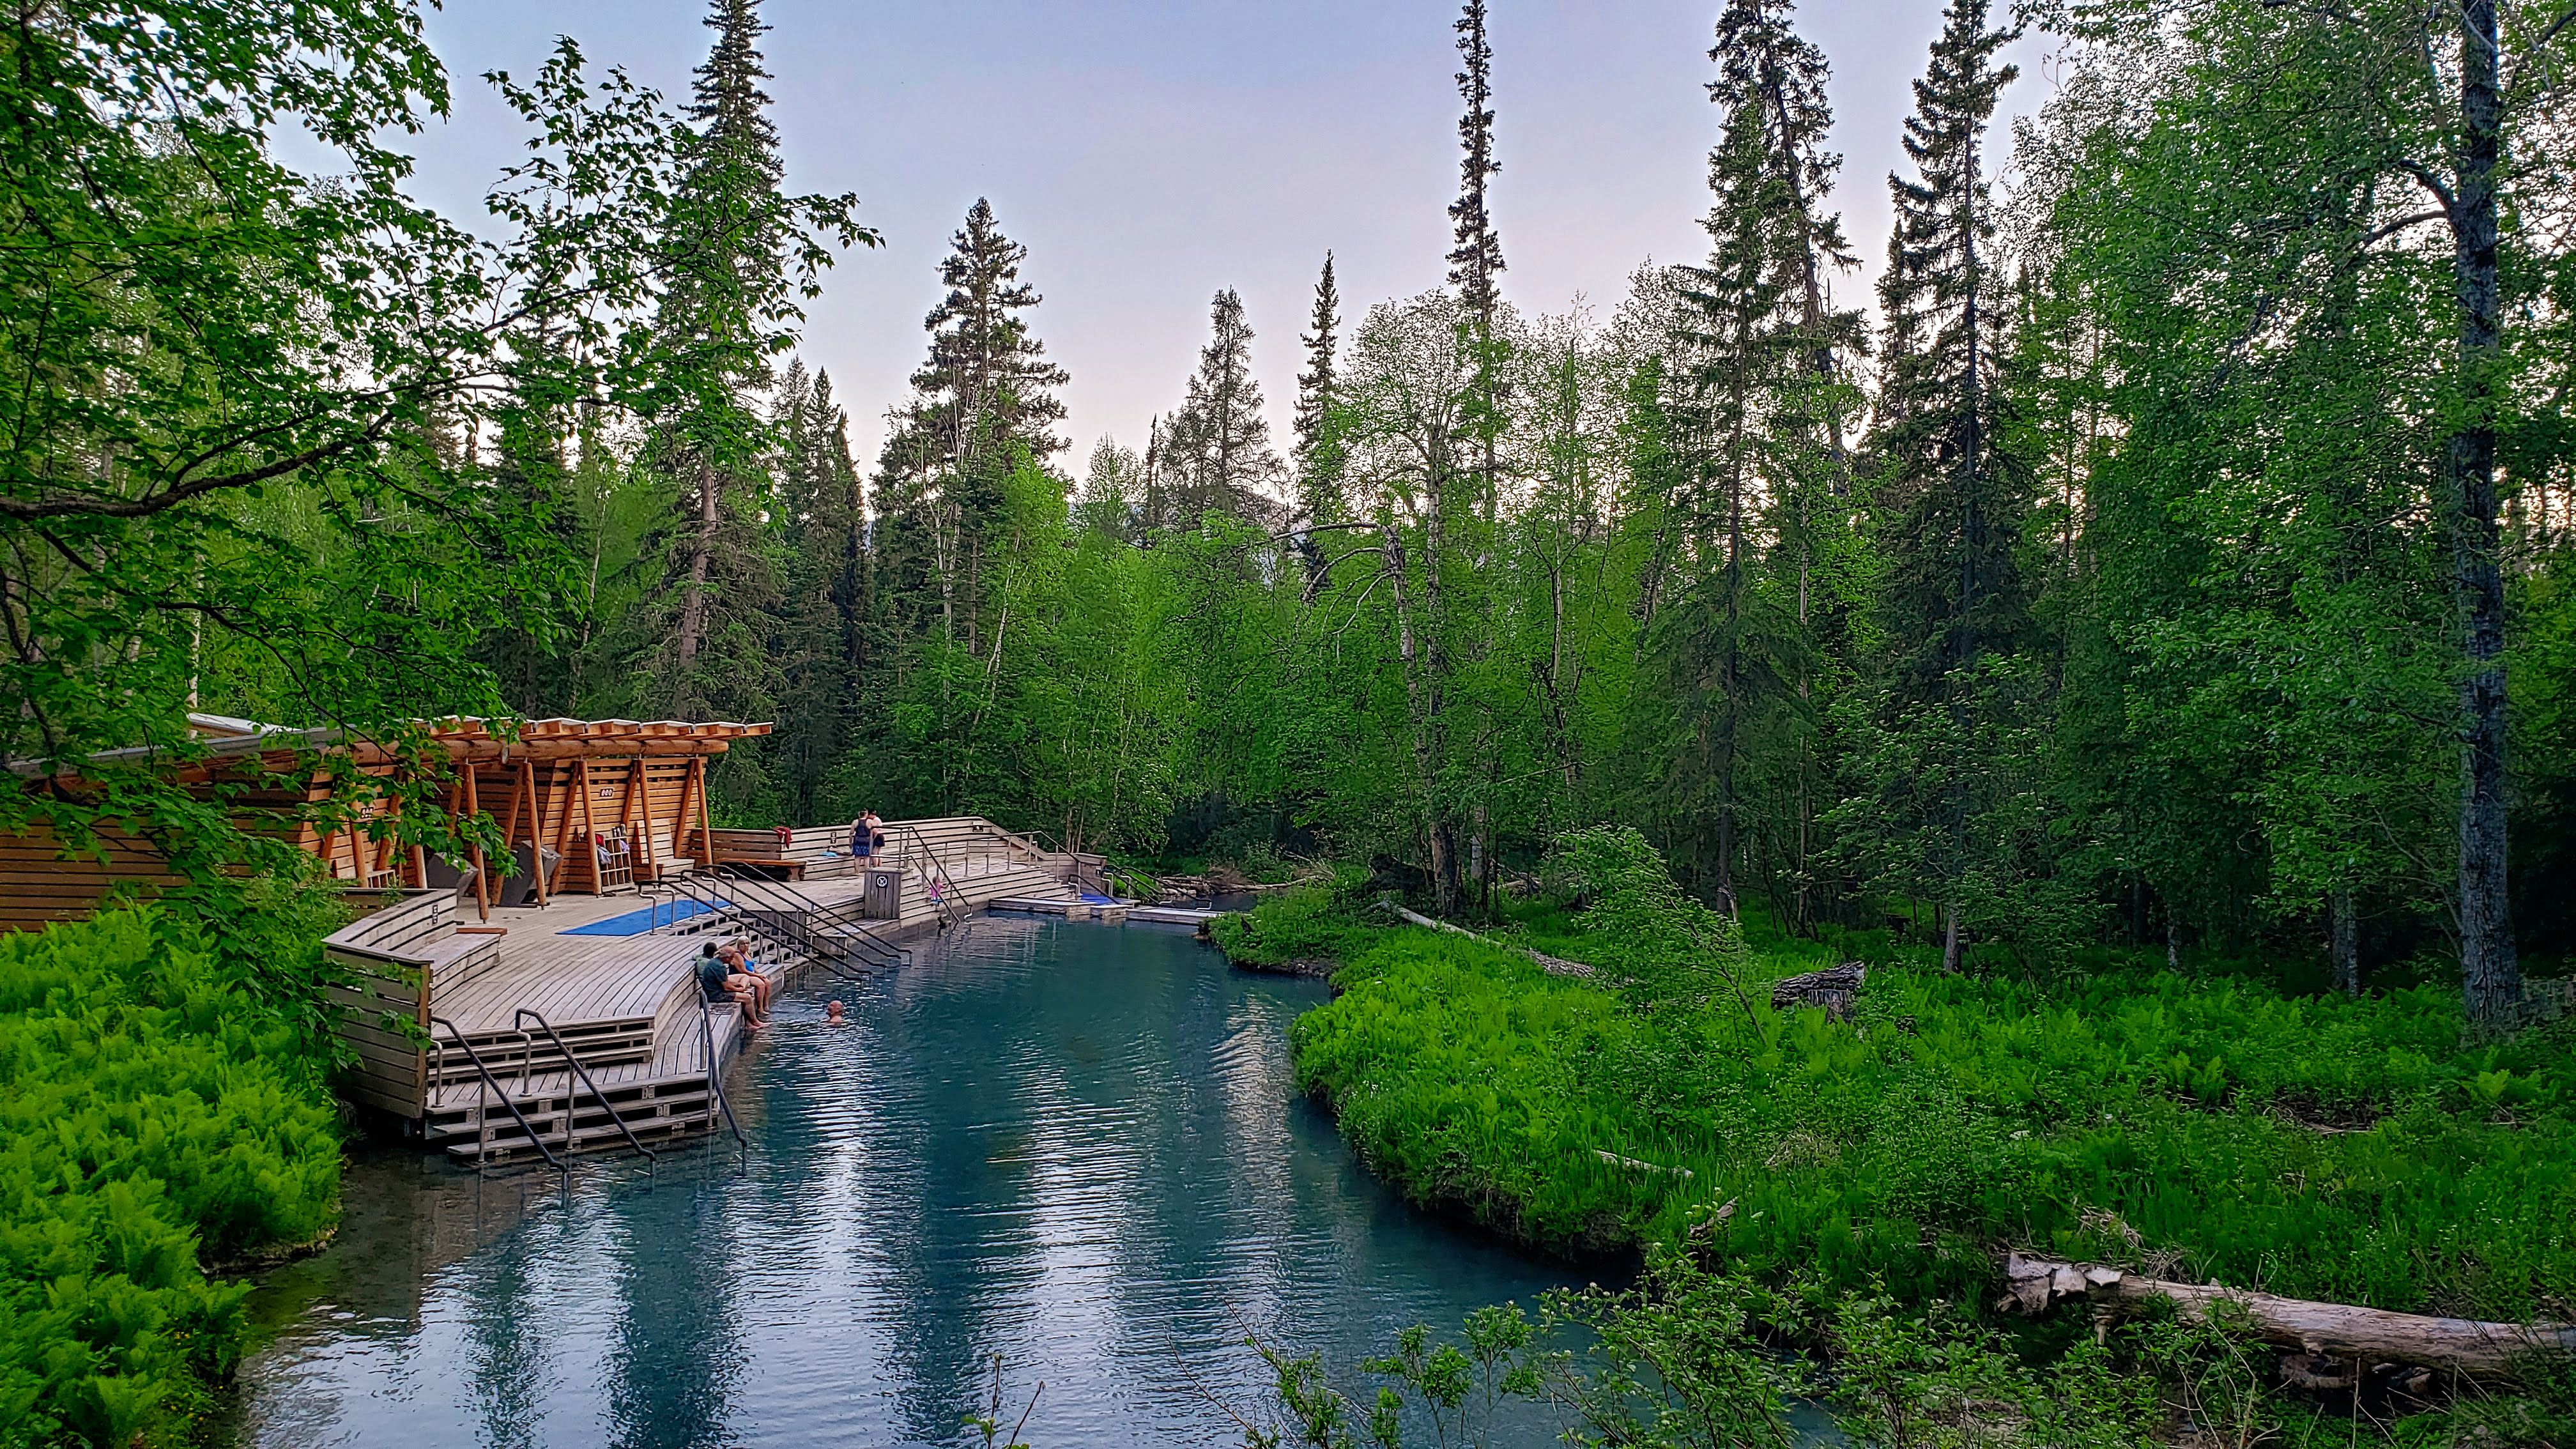 Liard River Hot Springs